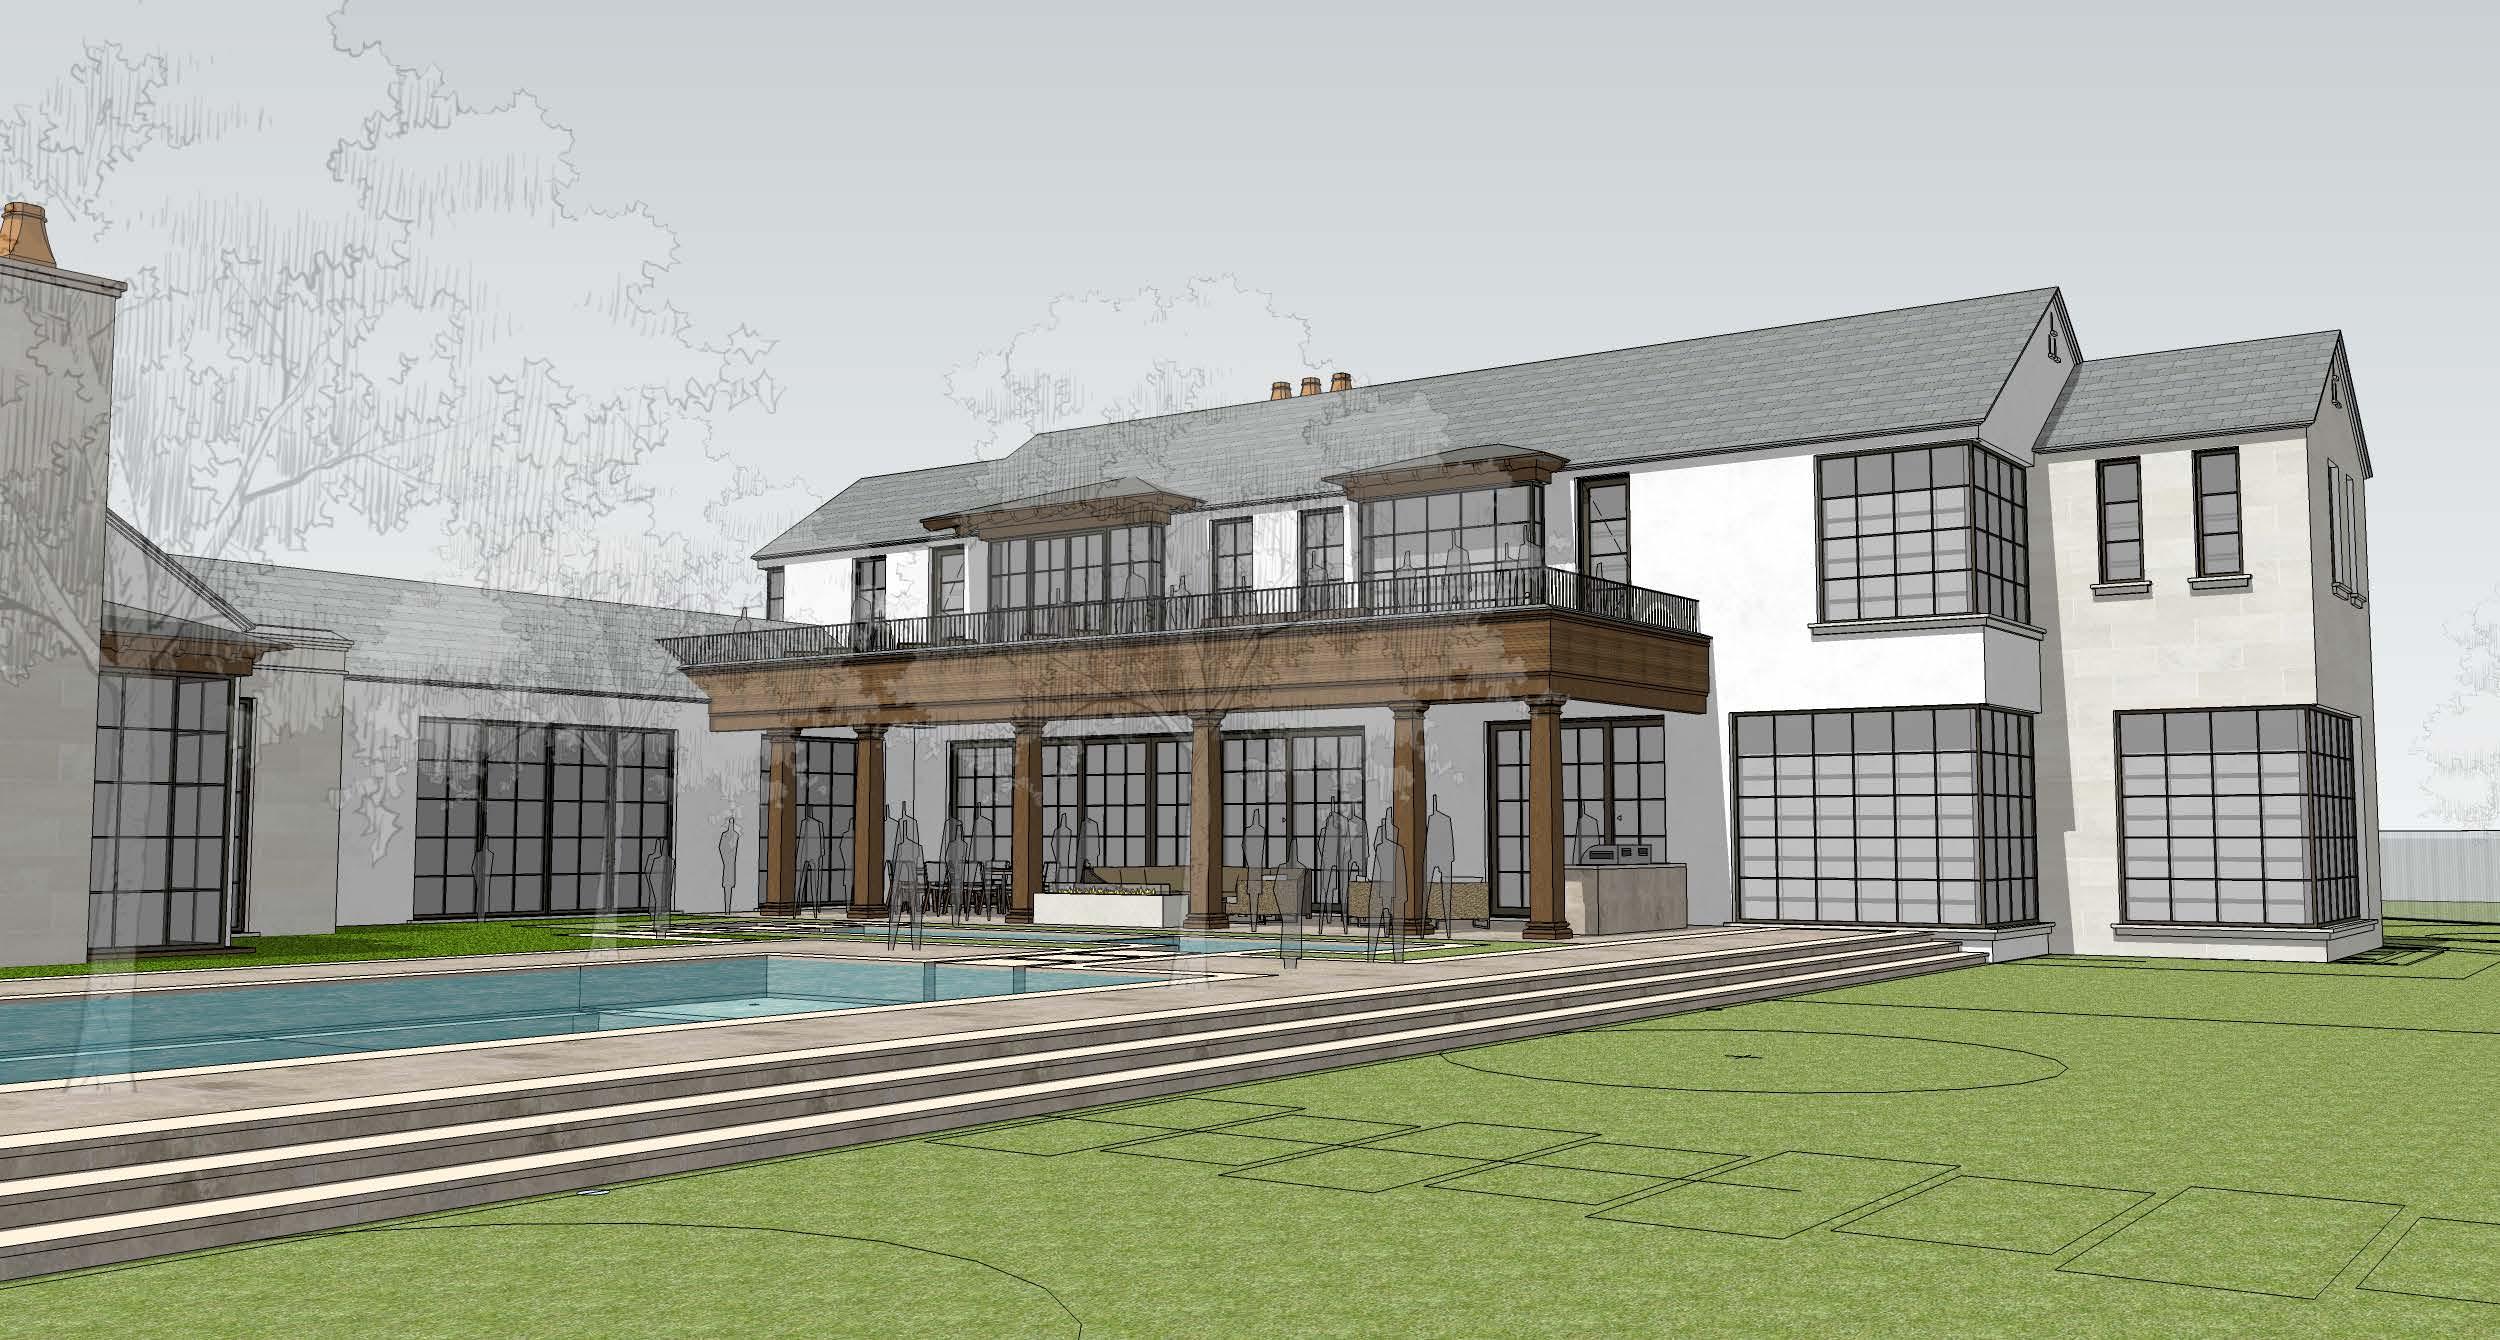 17-080_Vyas Residence_Model Views_Design Review_Page_8.jpg